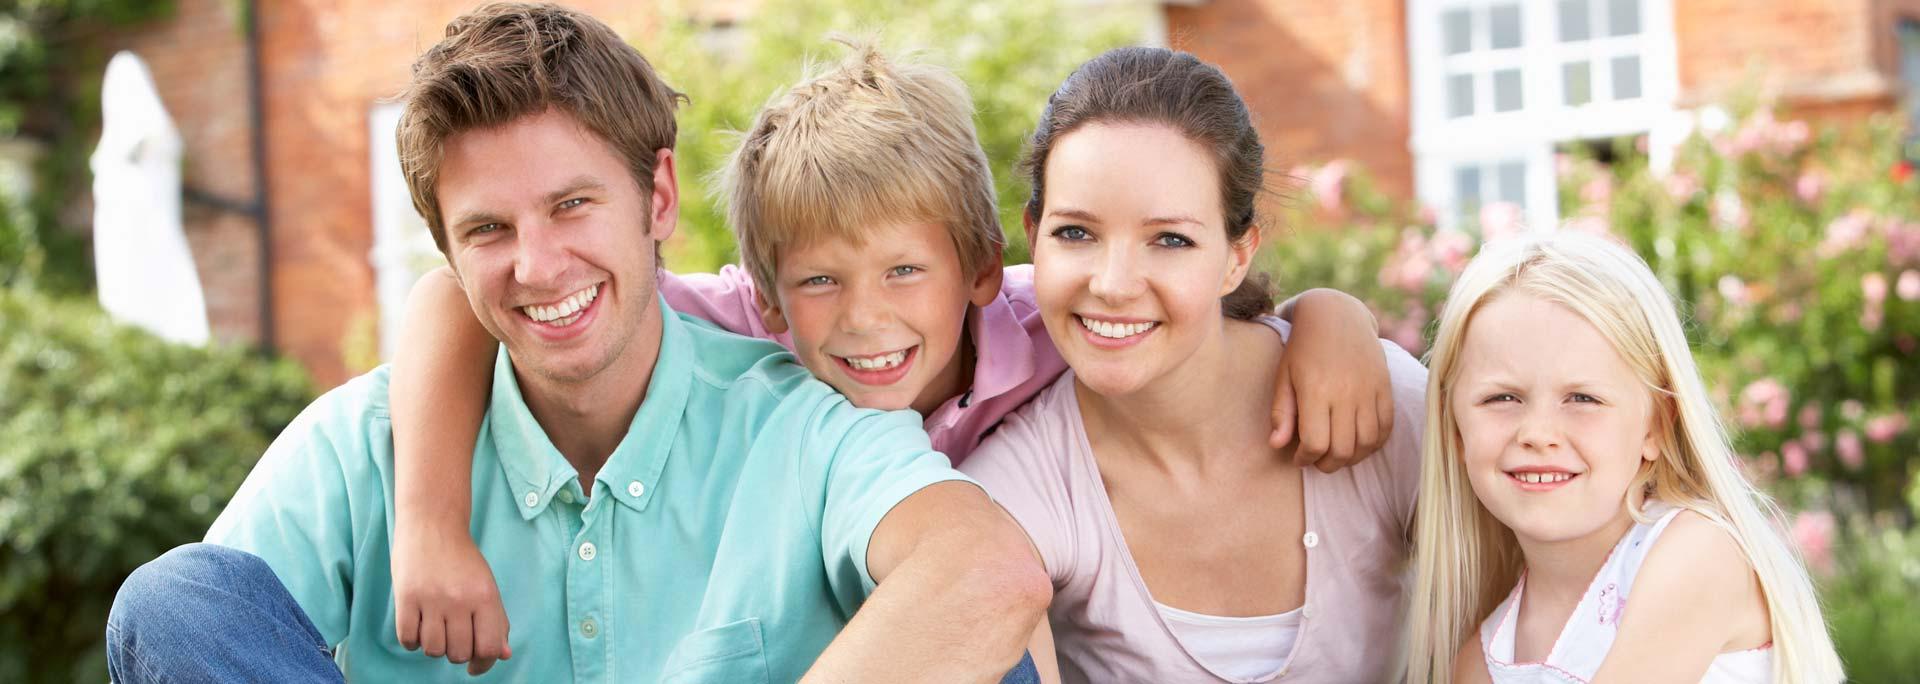 Chestermere Family Dentistry